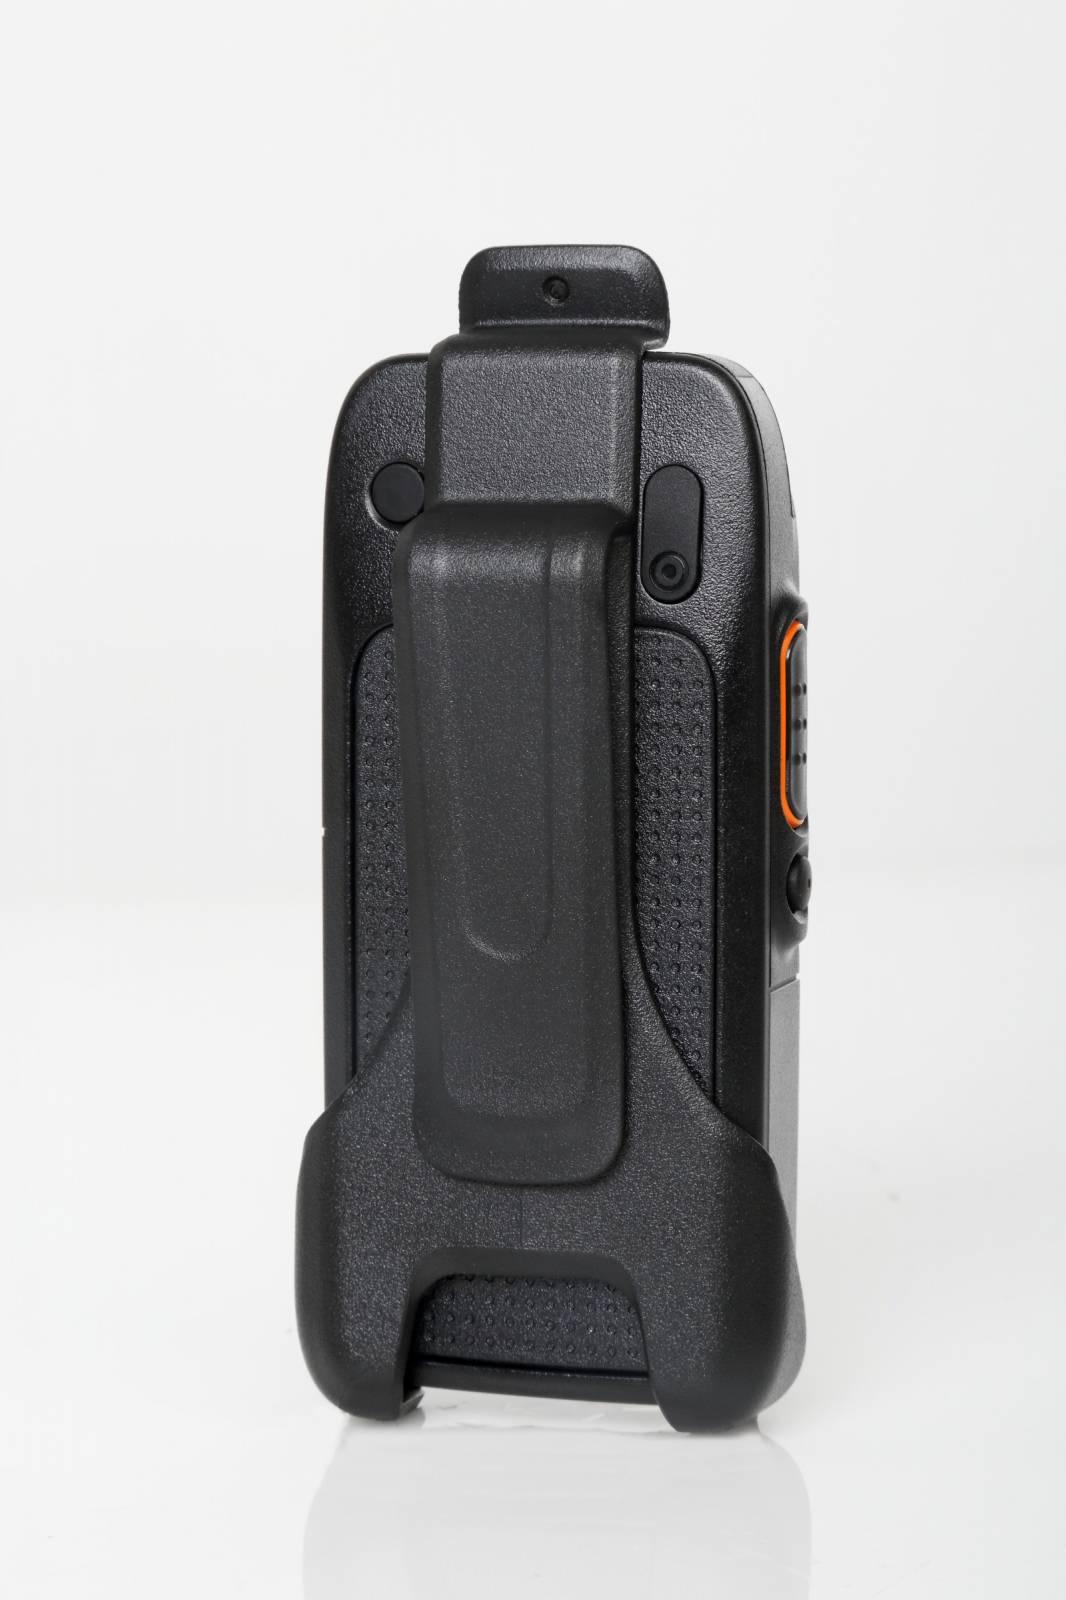 HYTERA PD355 DIGITAL PORTABLE